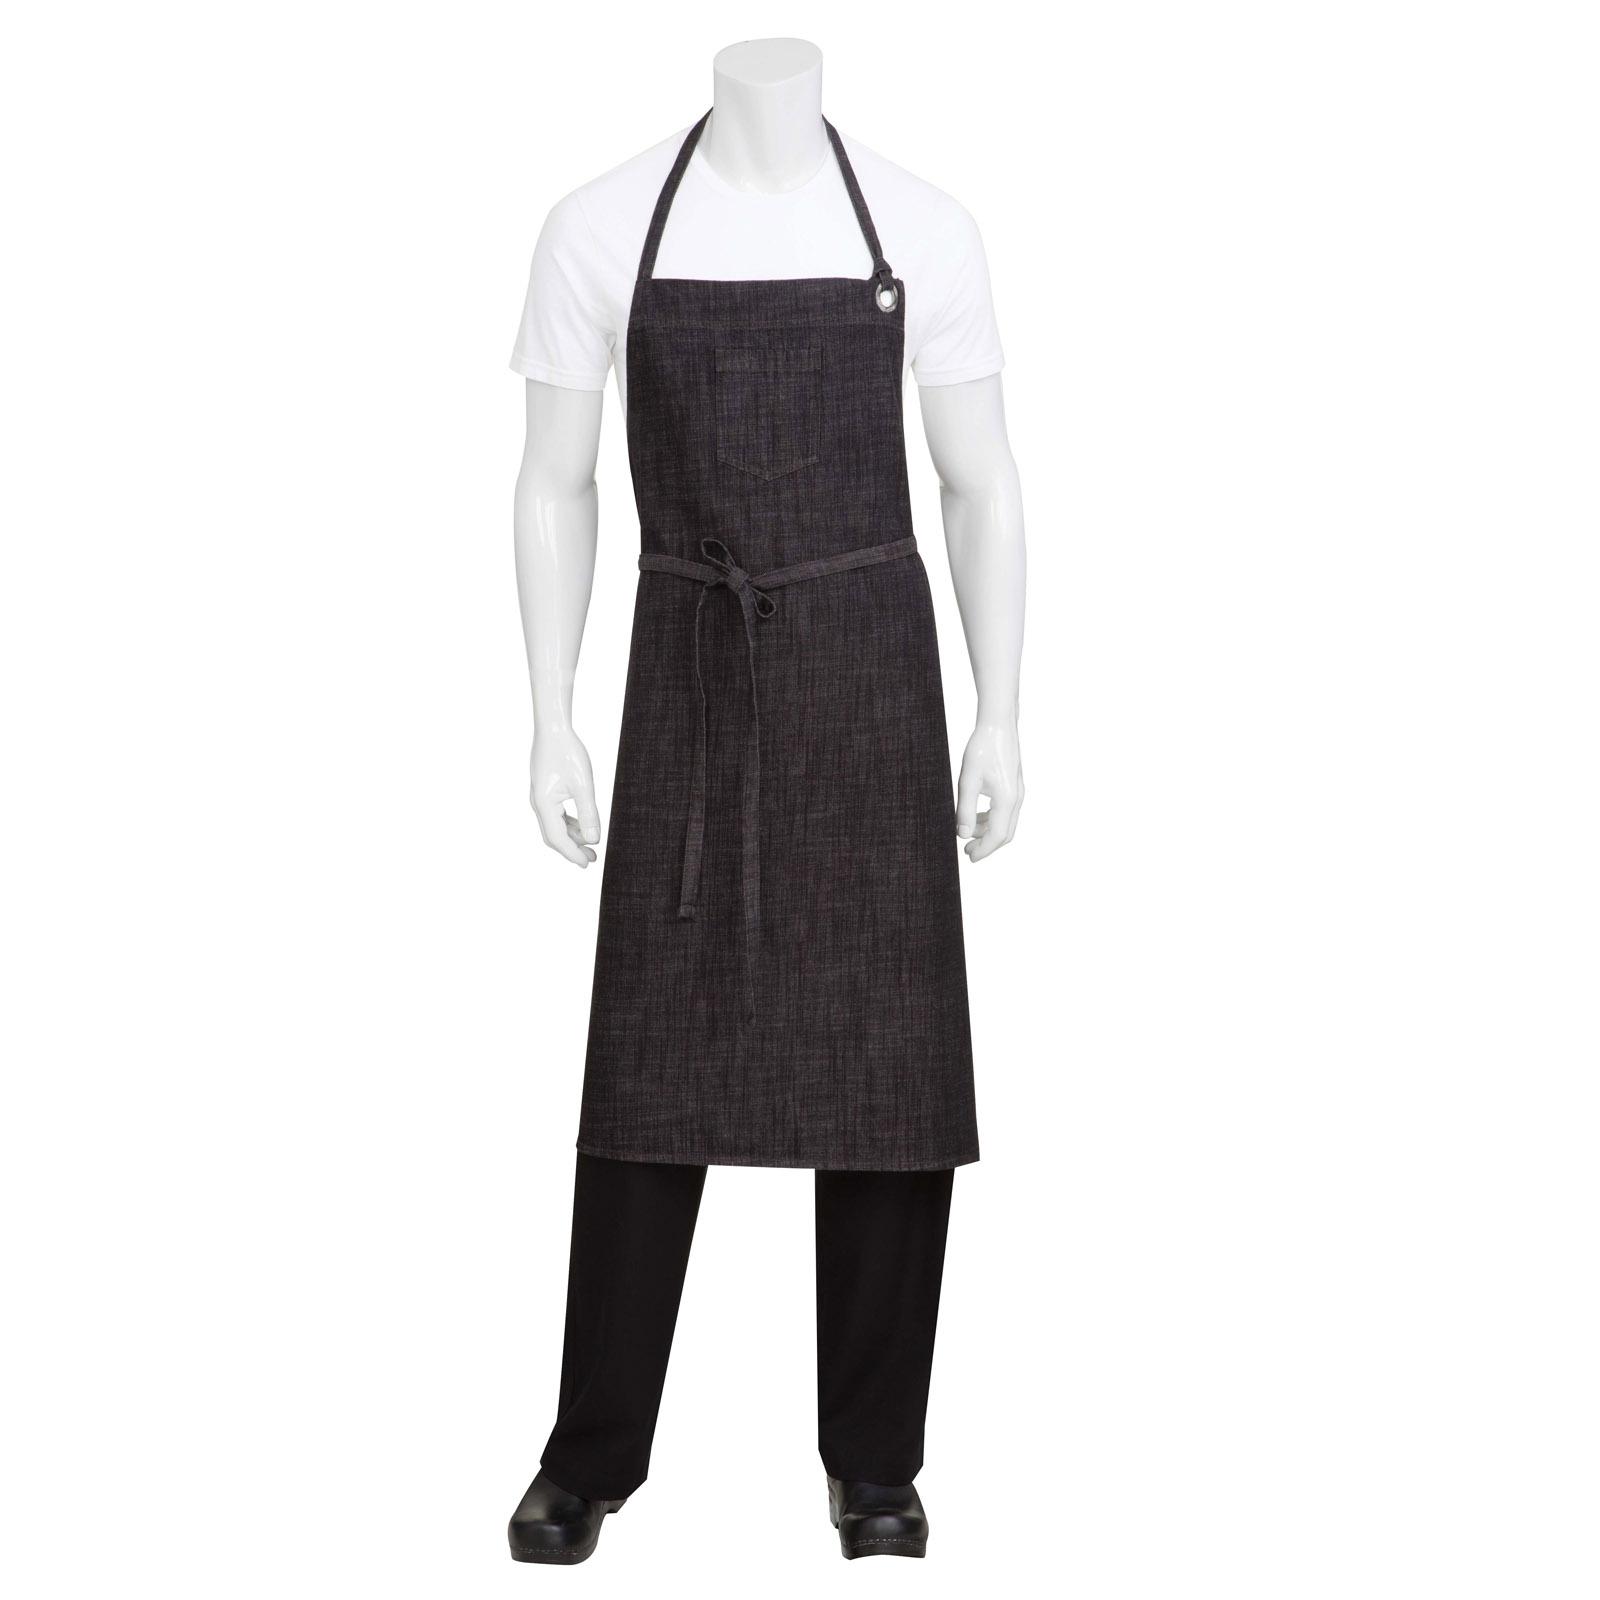 Chef Works ABCXX002BBG0 bib apron